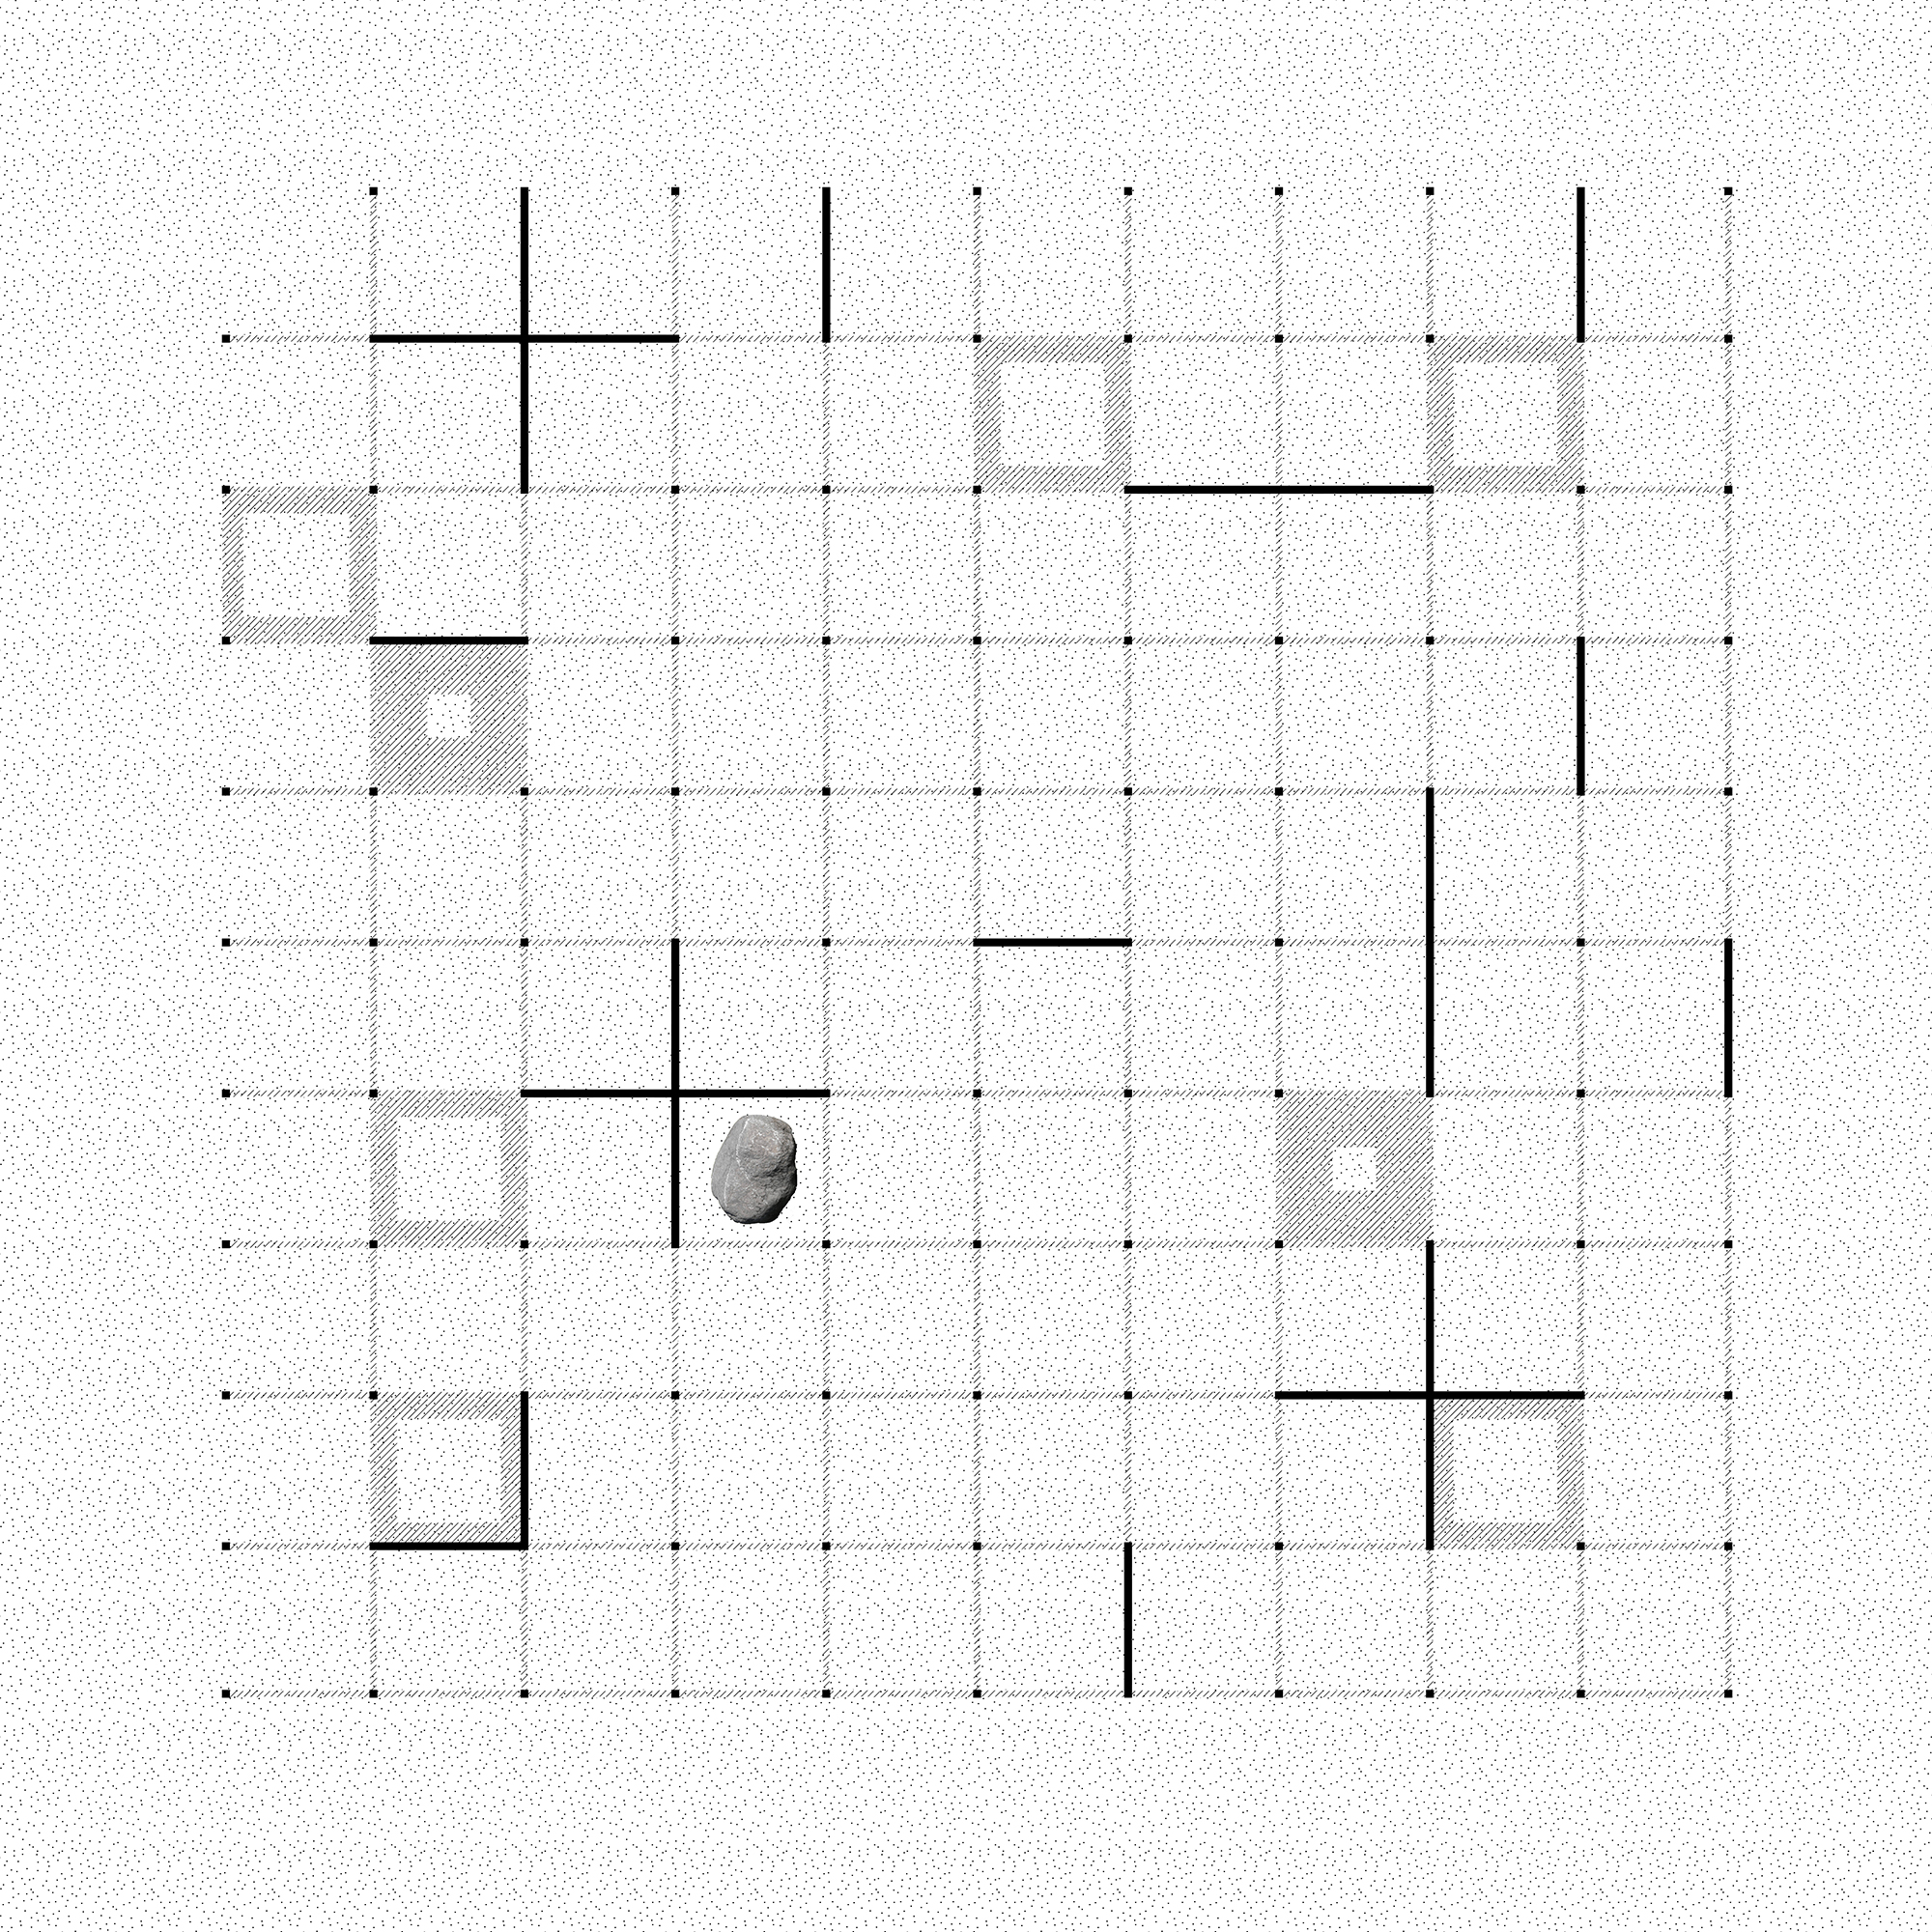 Plans-02LowRes.jpg